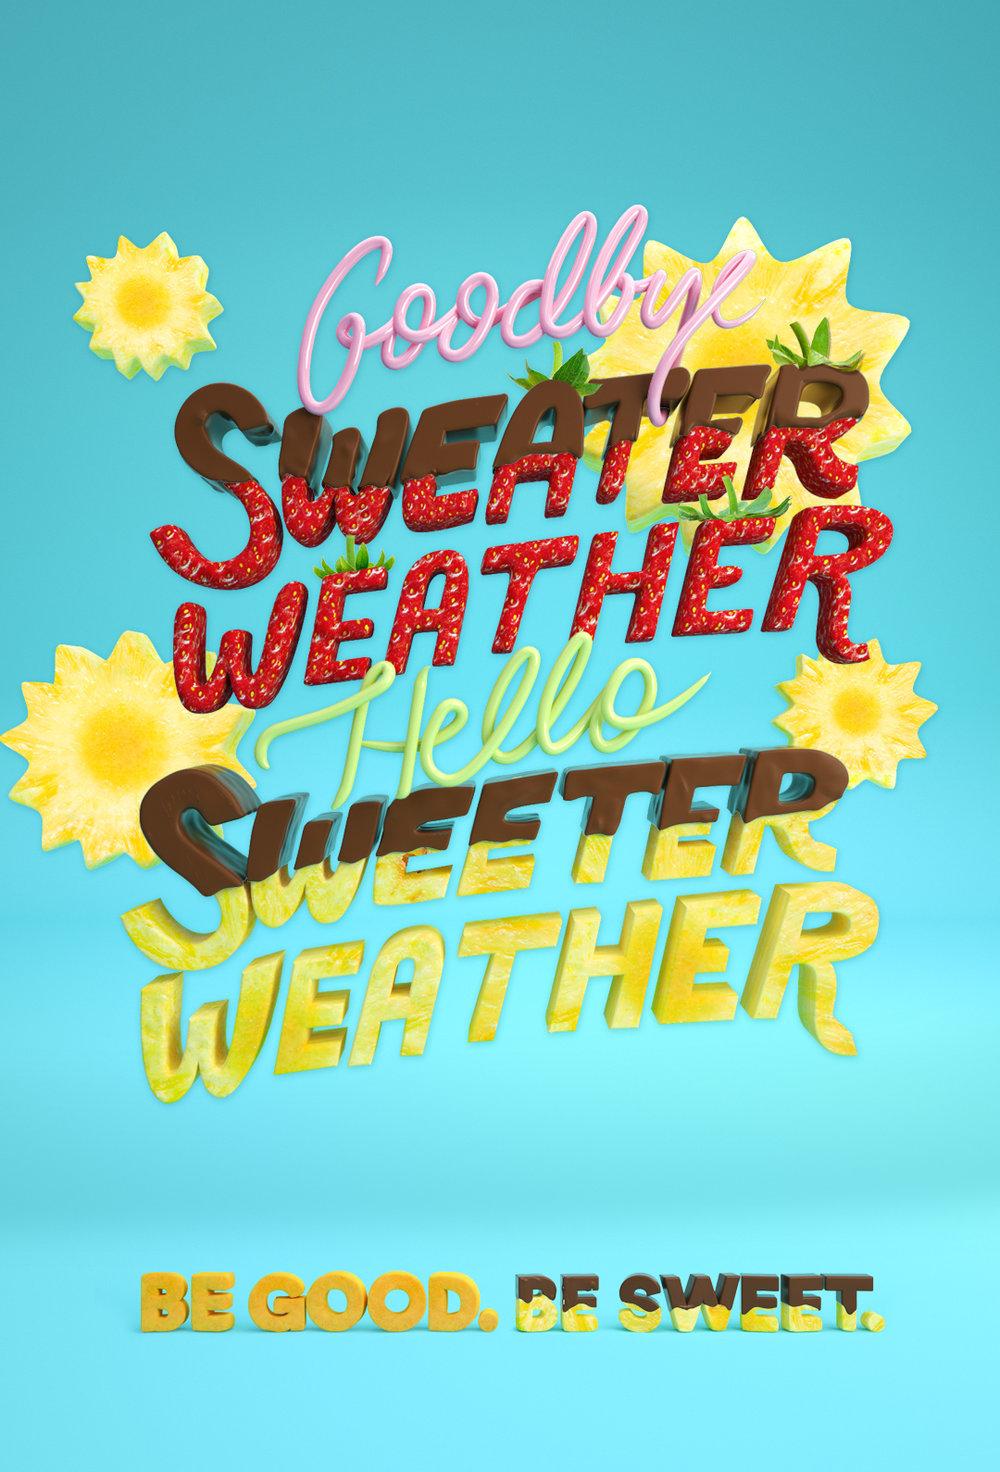 sweater-poster-update.jpg